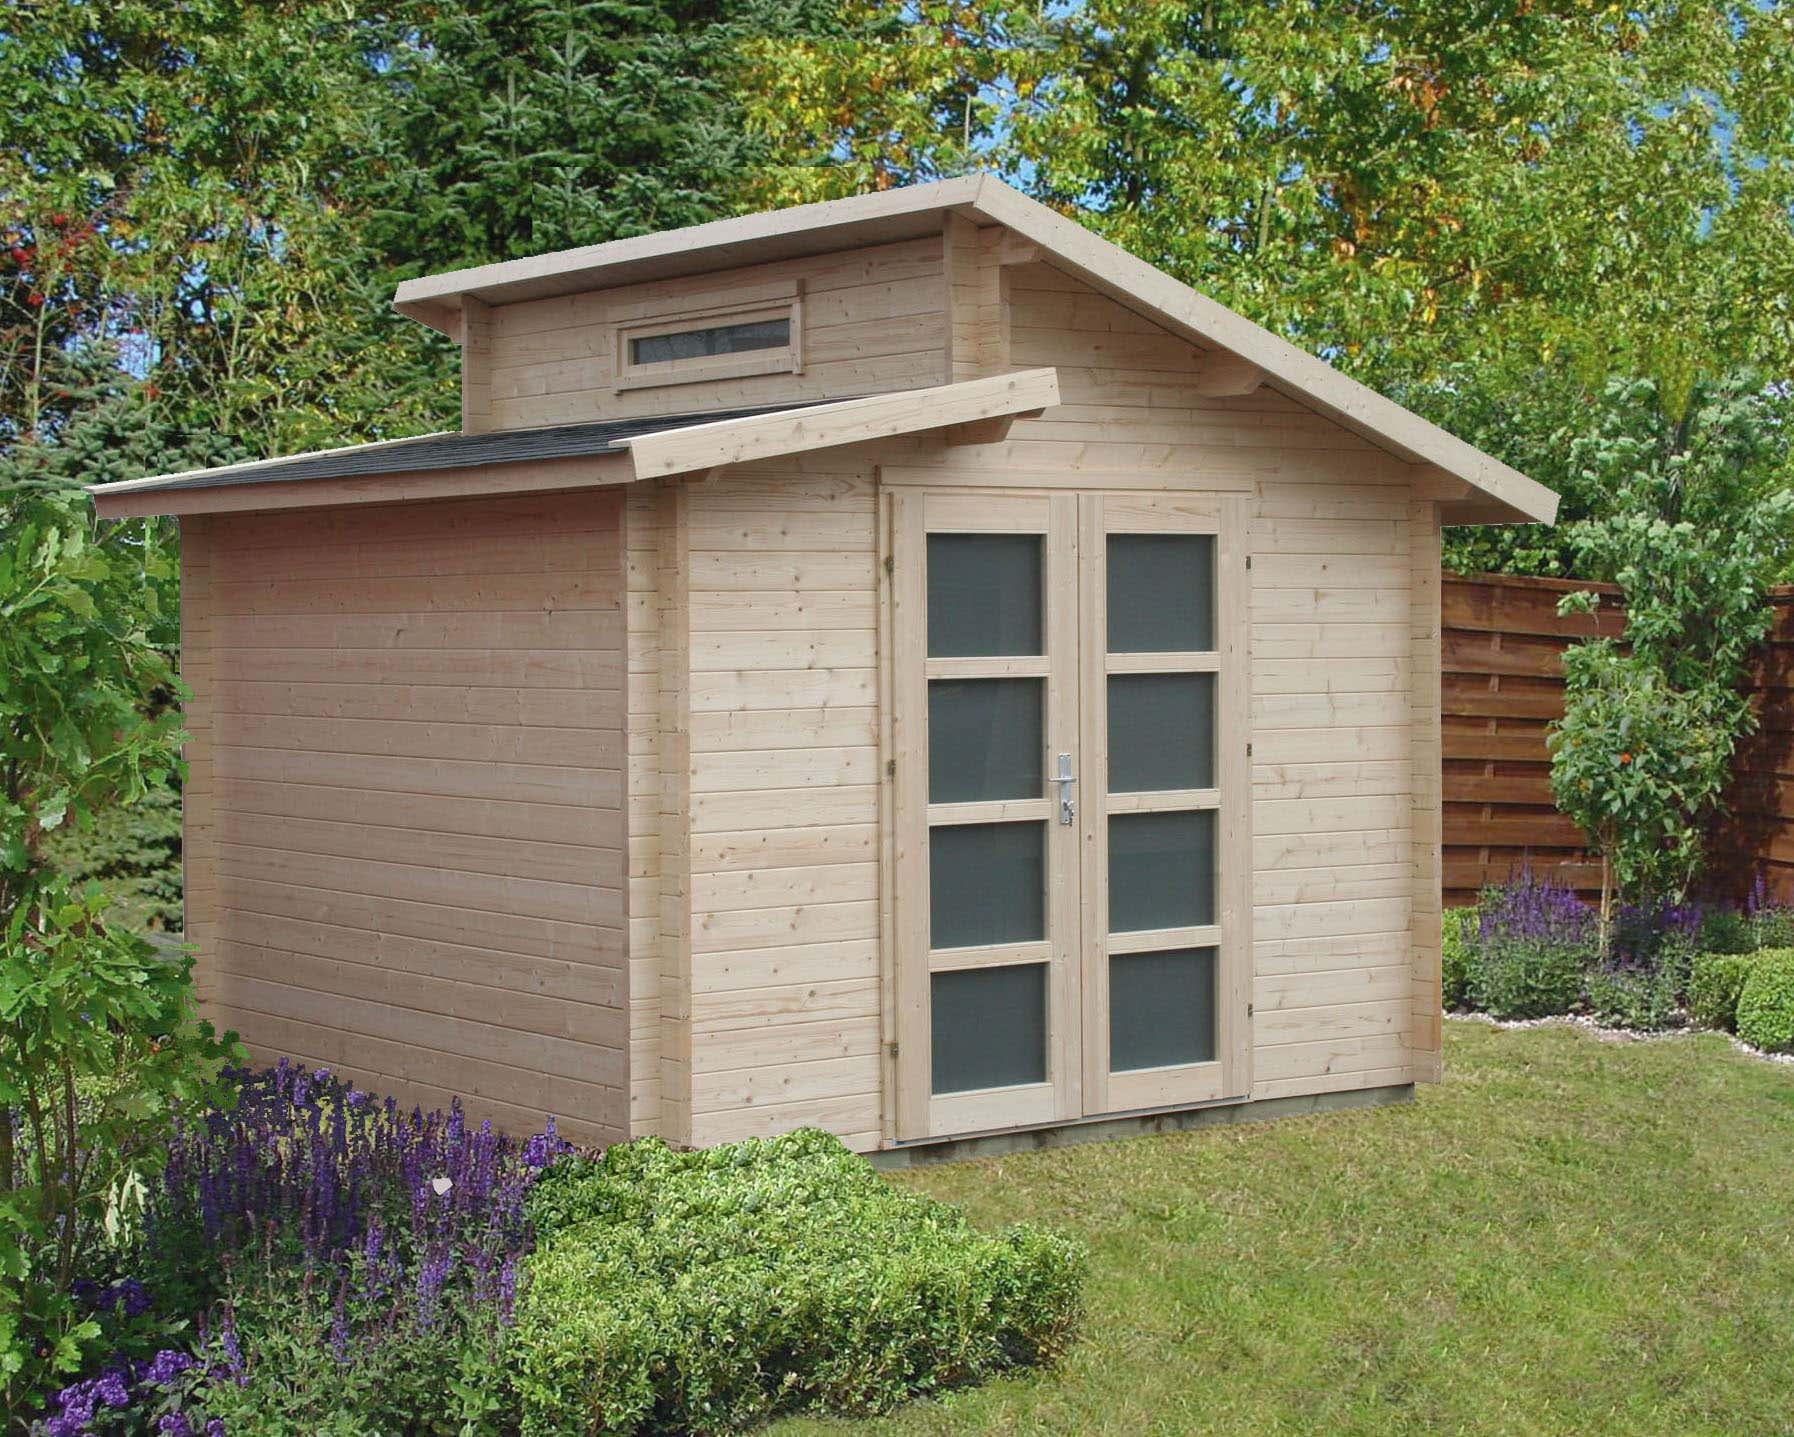 doppel pultdach gartenhaus modell aktiva 40 doppel. Black Bedroom Furniture Sets. Home Design Ideas